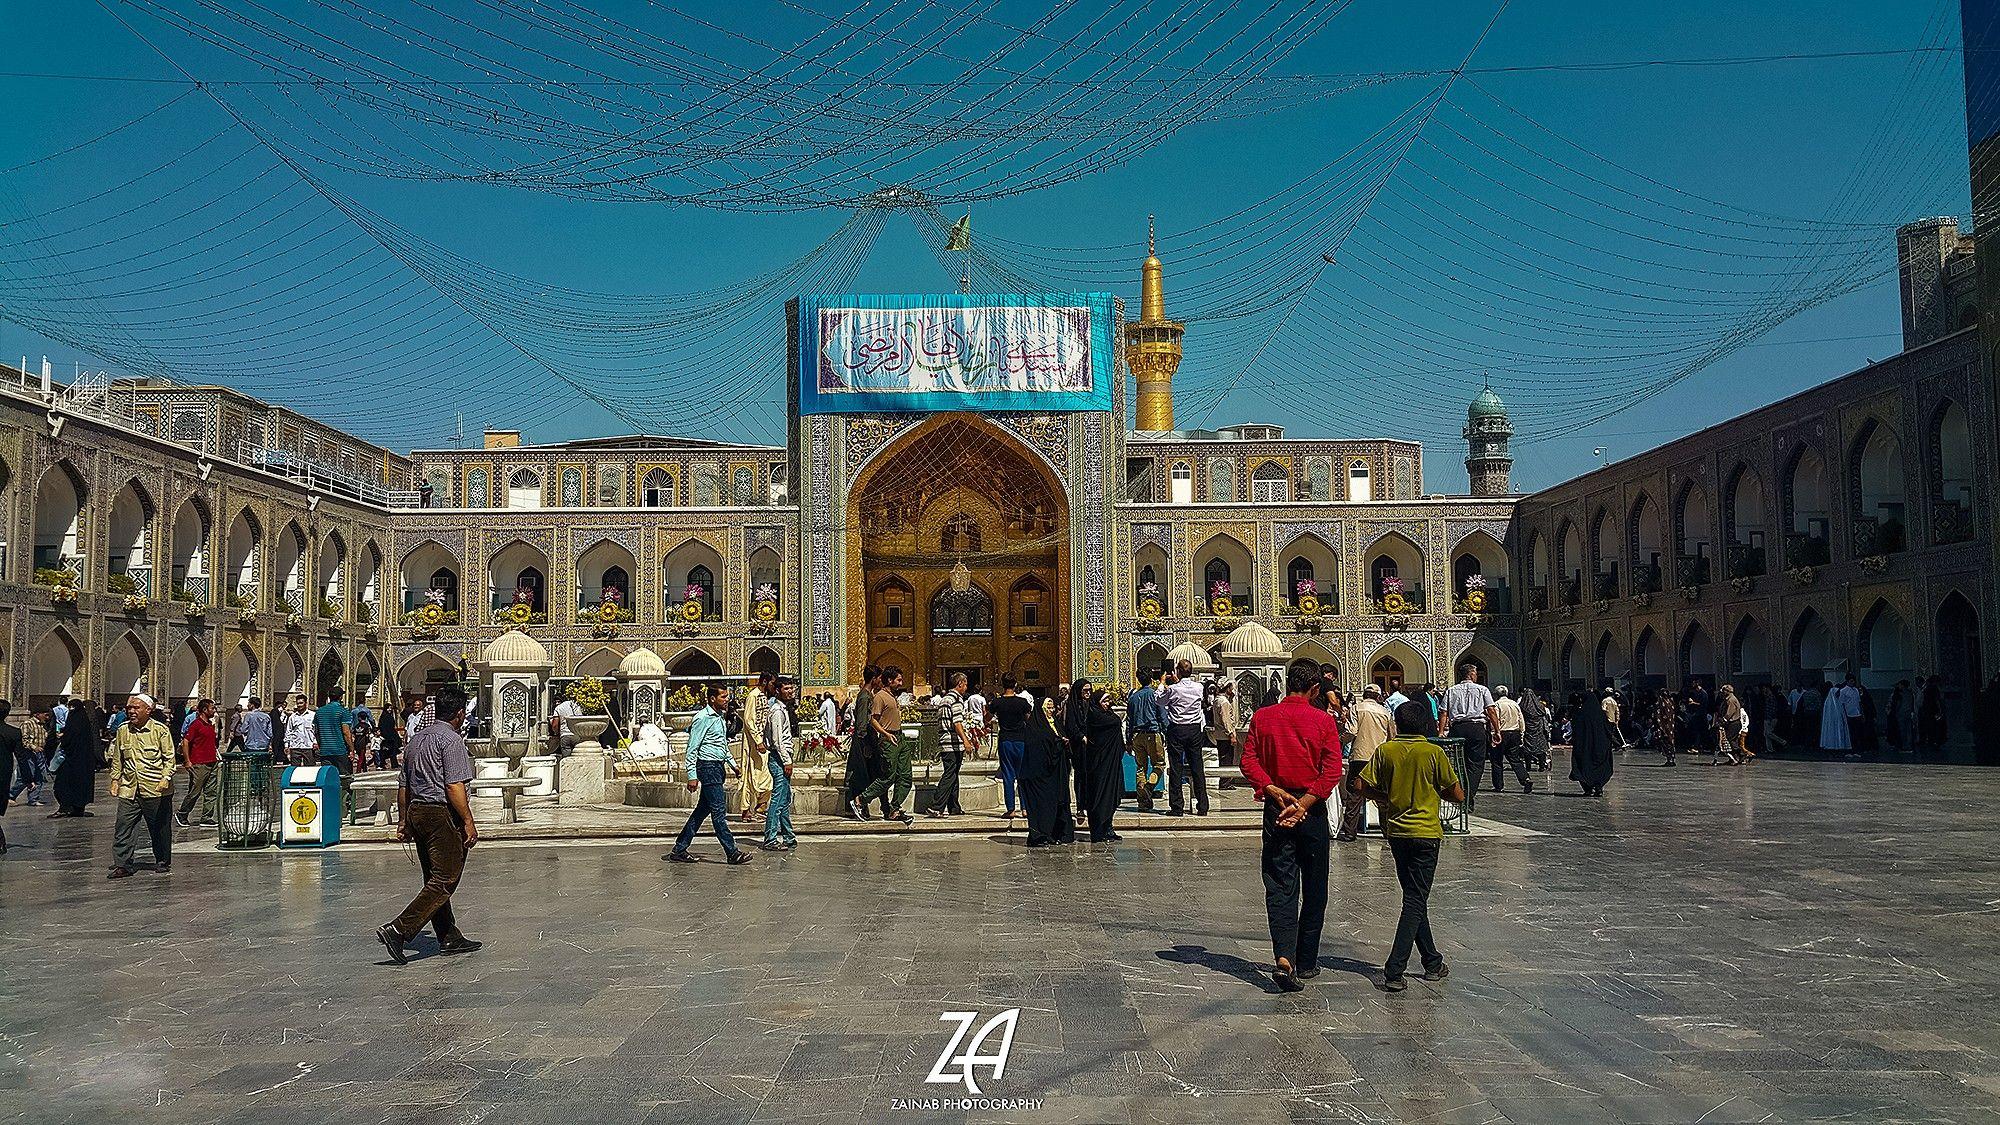 مرقد الإمام علي بن موسى الرضا عليه السلام مشهد إيران The Holy Shrine Of Imam Ali Alrida Mashhad Iran C Zainab Photography Photography Photo Landmarks